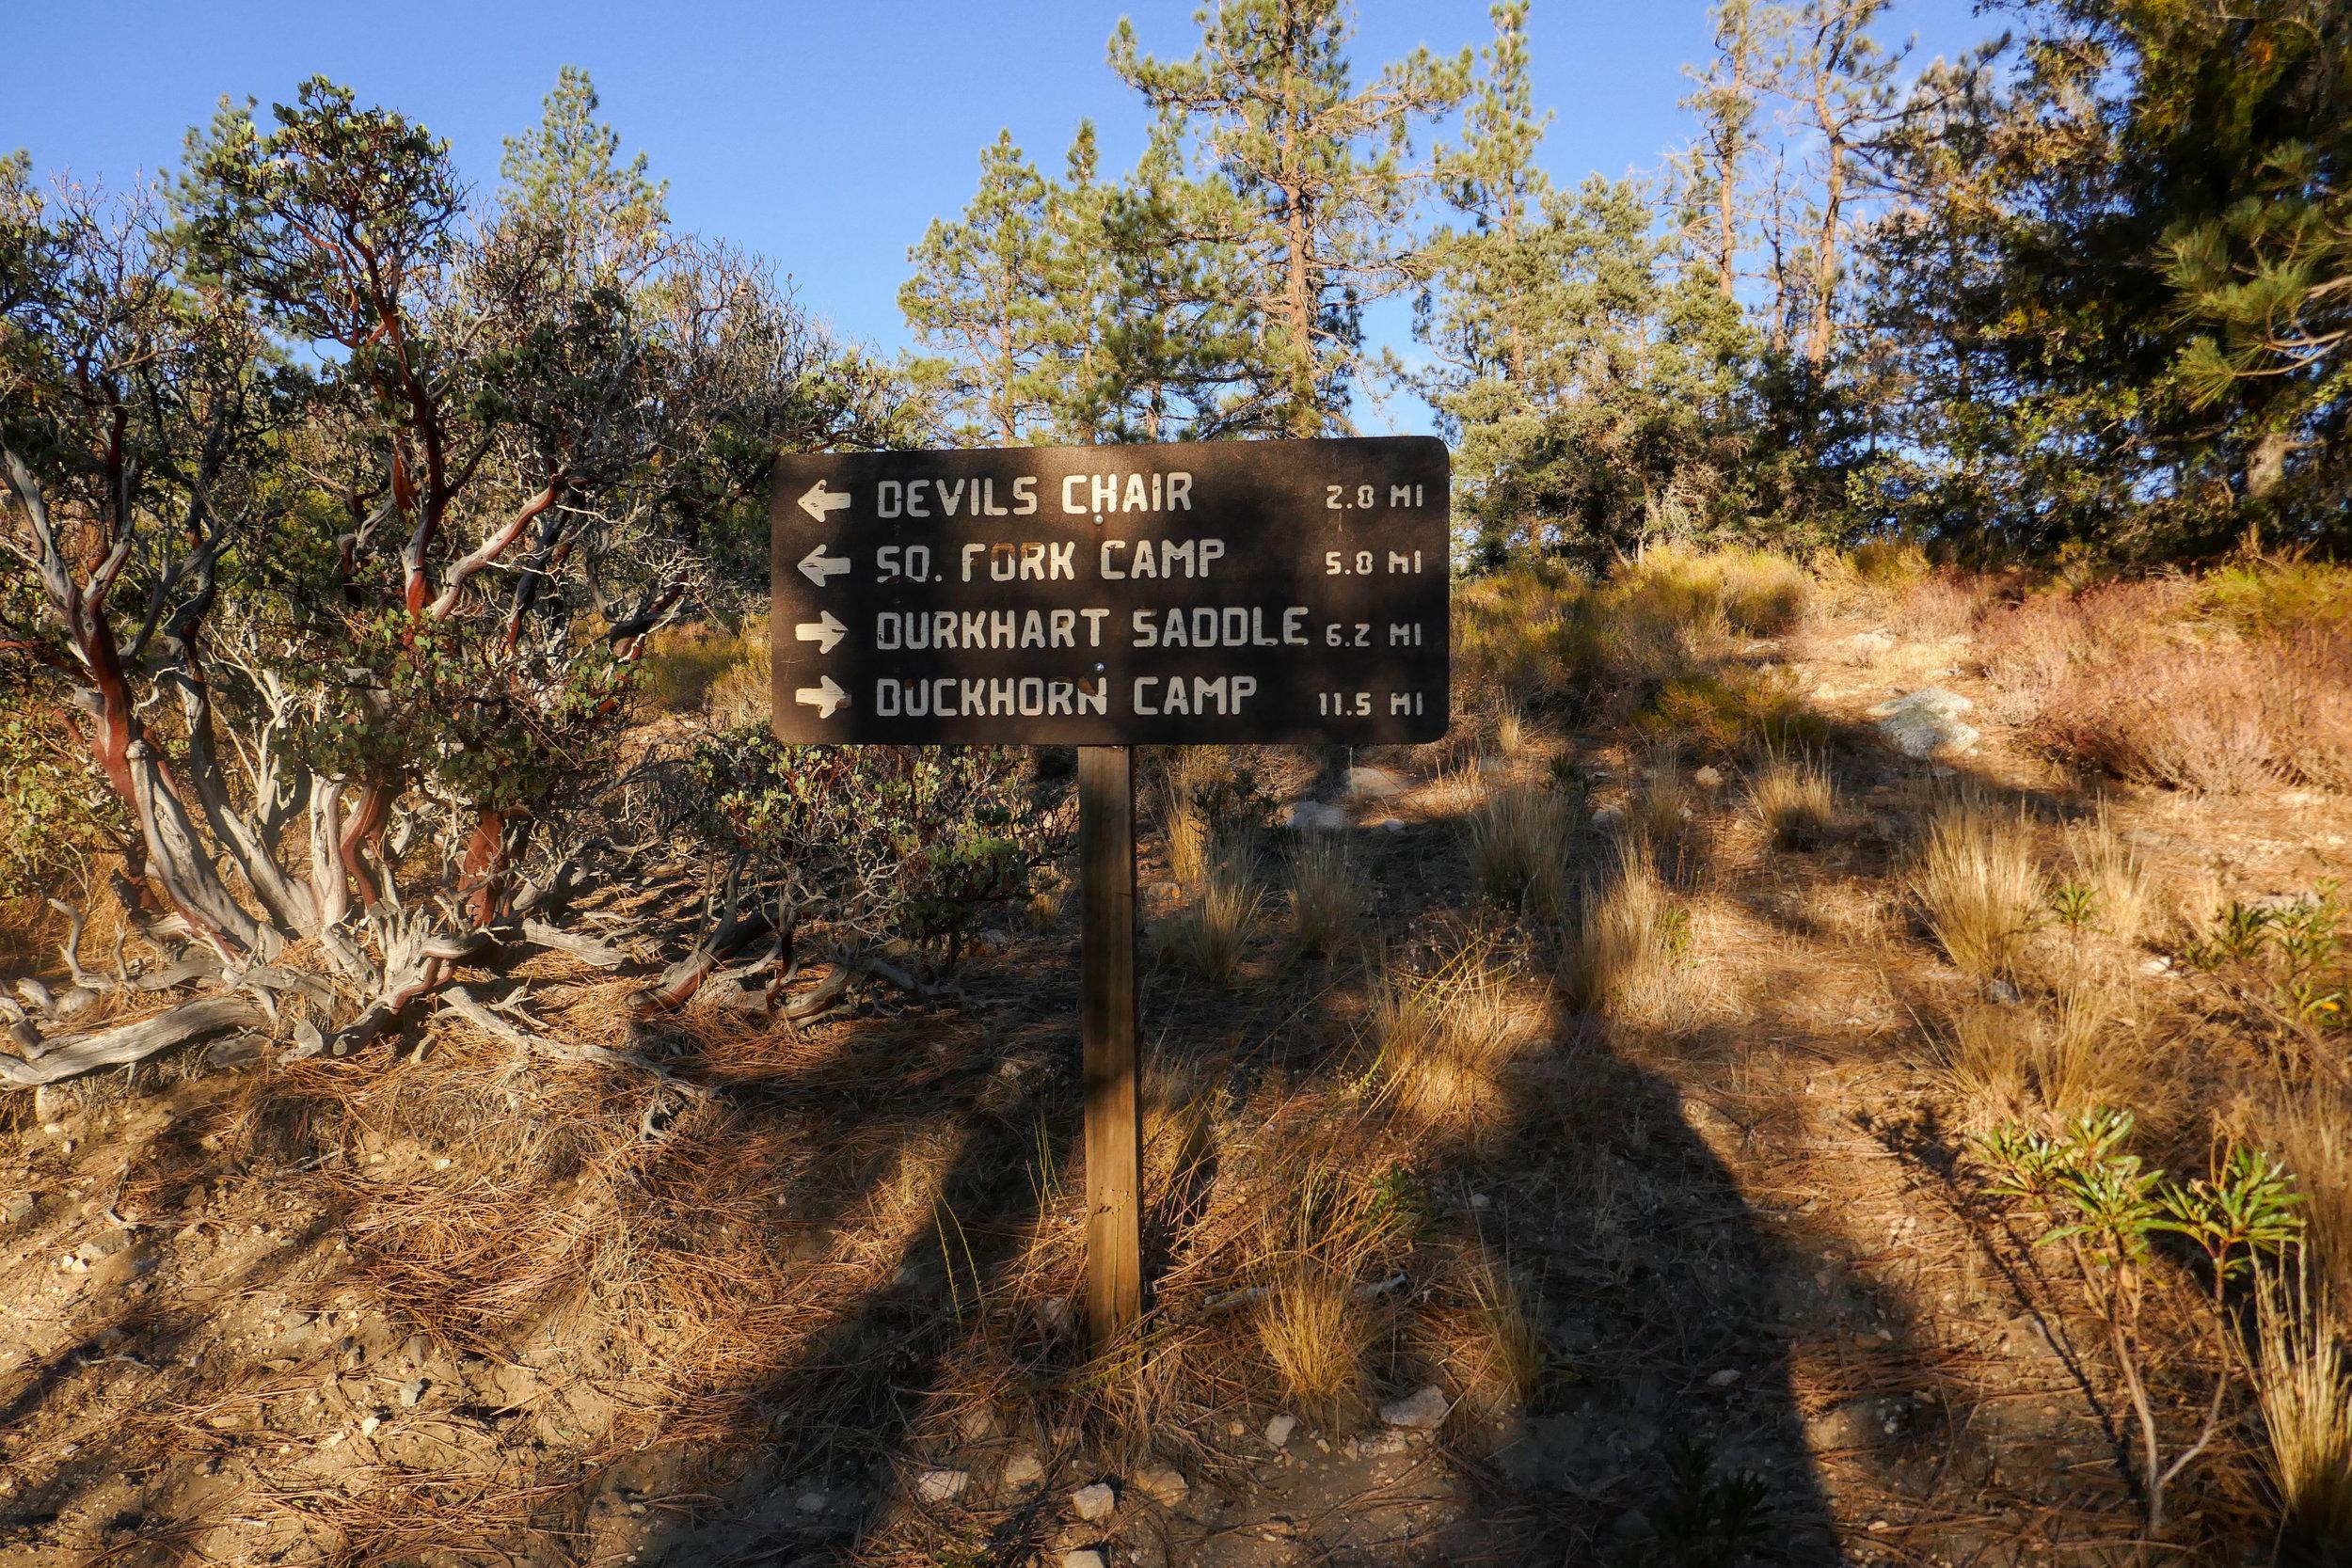 Now leaving the Burkhart trail and heading onto the Devil's Chair Trail, aka High Desert National Recreation Trail.